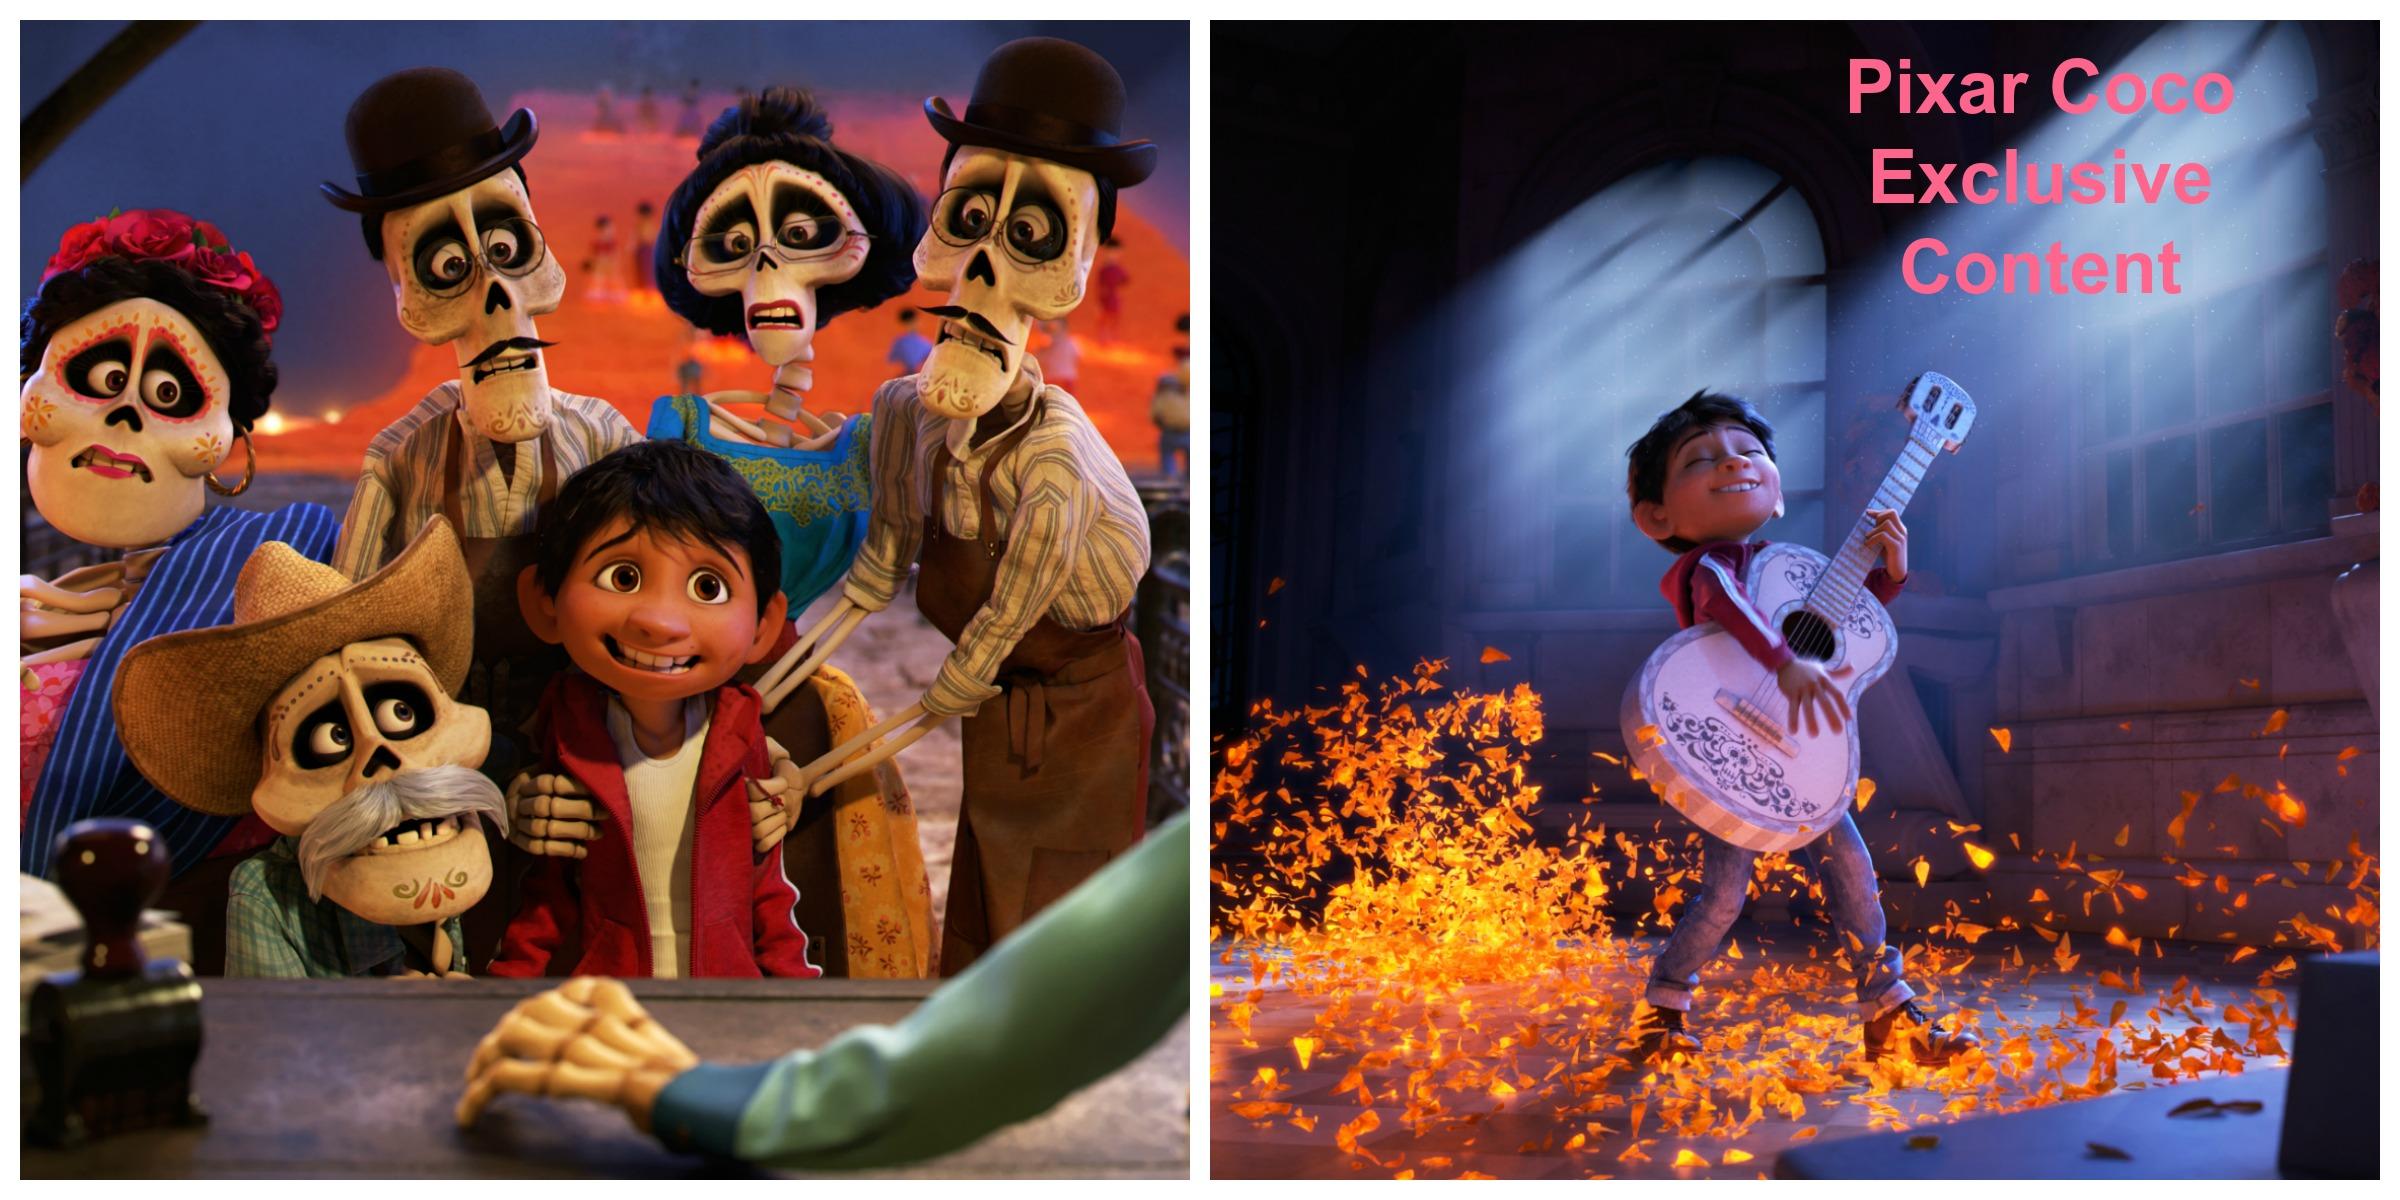 Pixar COCO Exclusive Interviews and Content @PixarCOCO #PixarCocoEvent